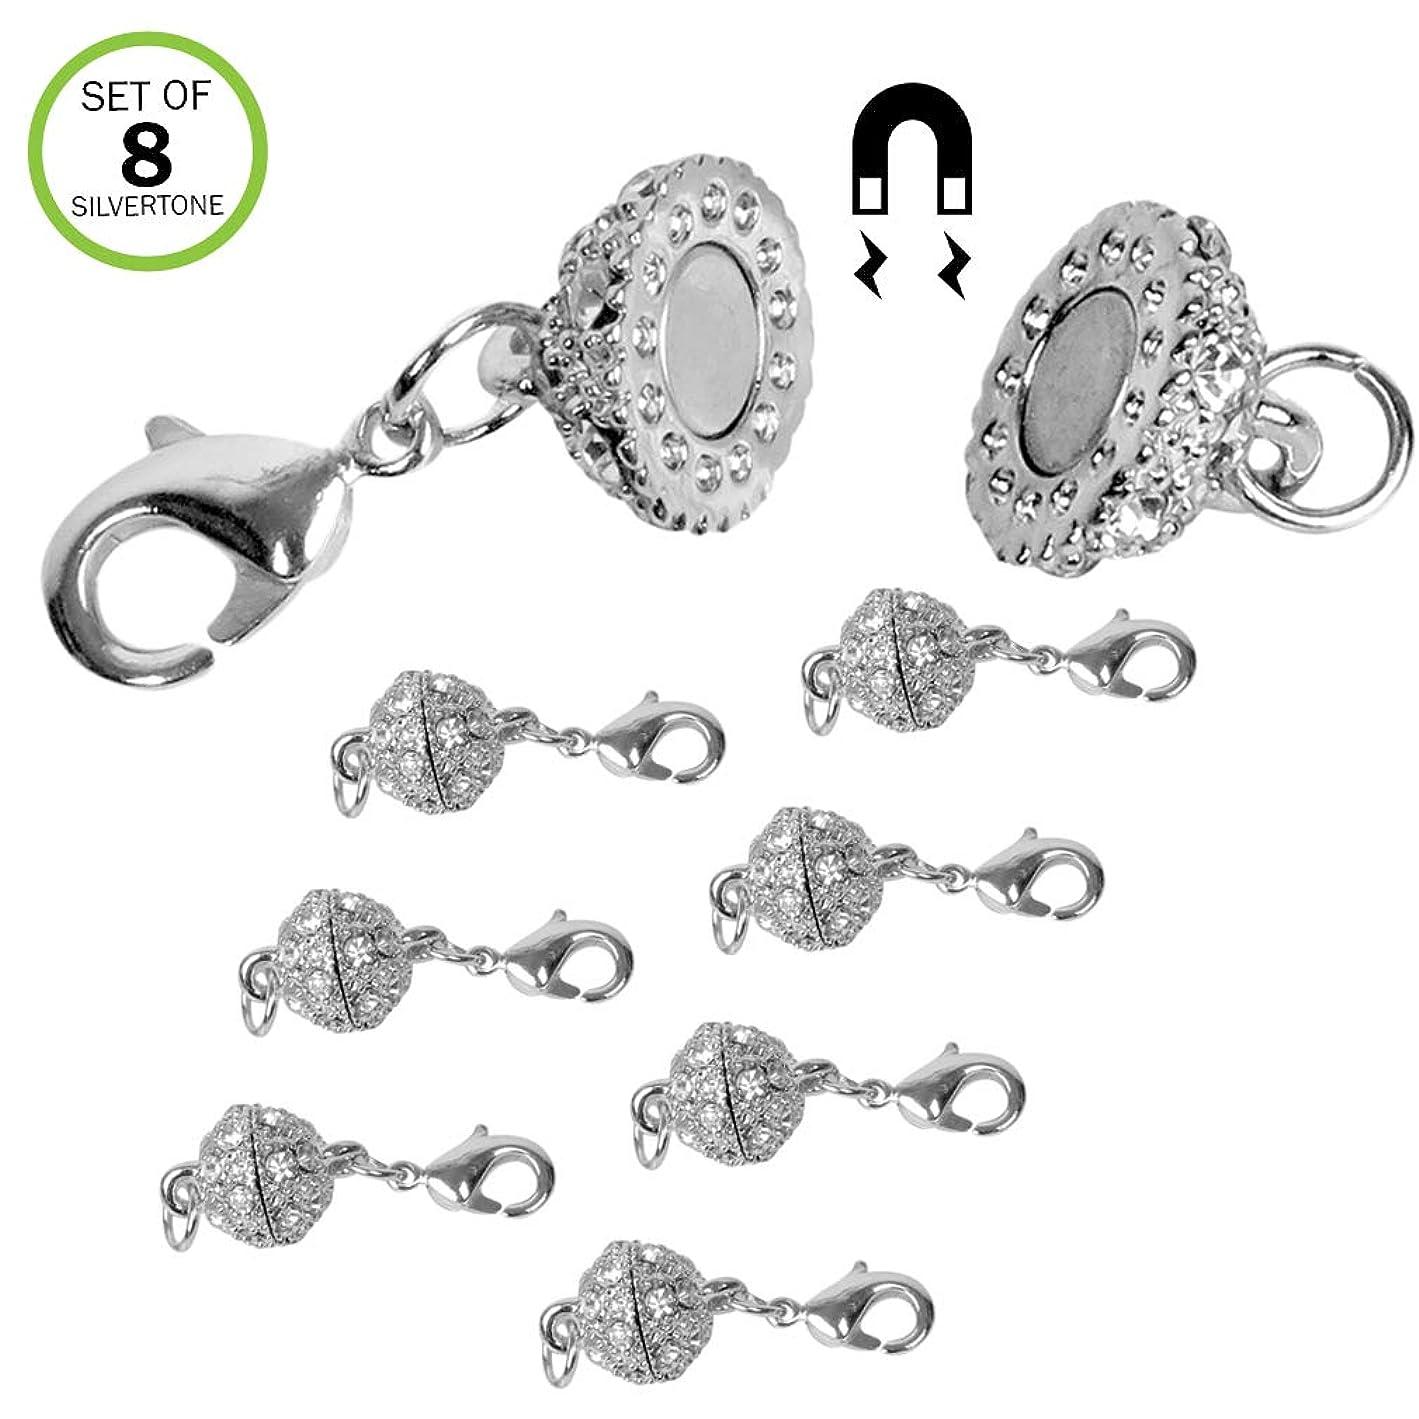 Evelots Magnetic Jewelry Clasps, Rhinestone Ball, Goldtone Or Silvertone- Set/8 x44581429796666